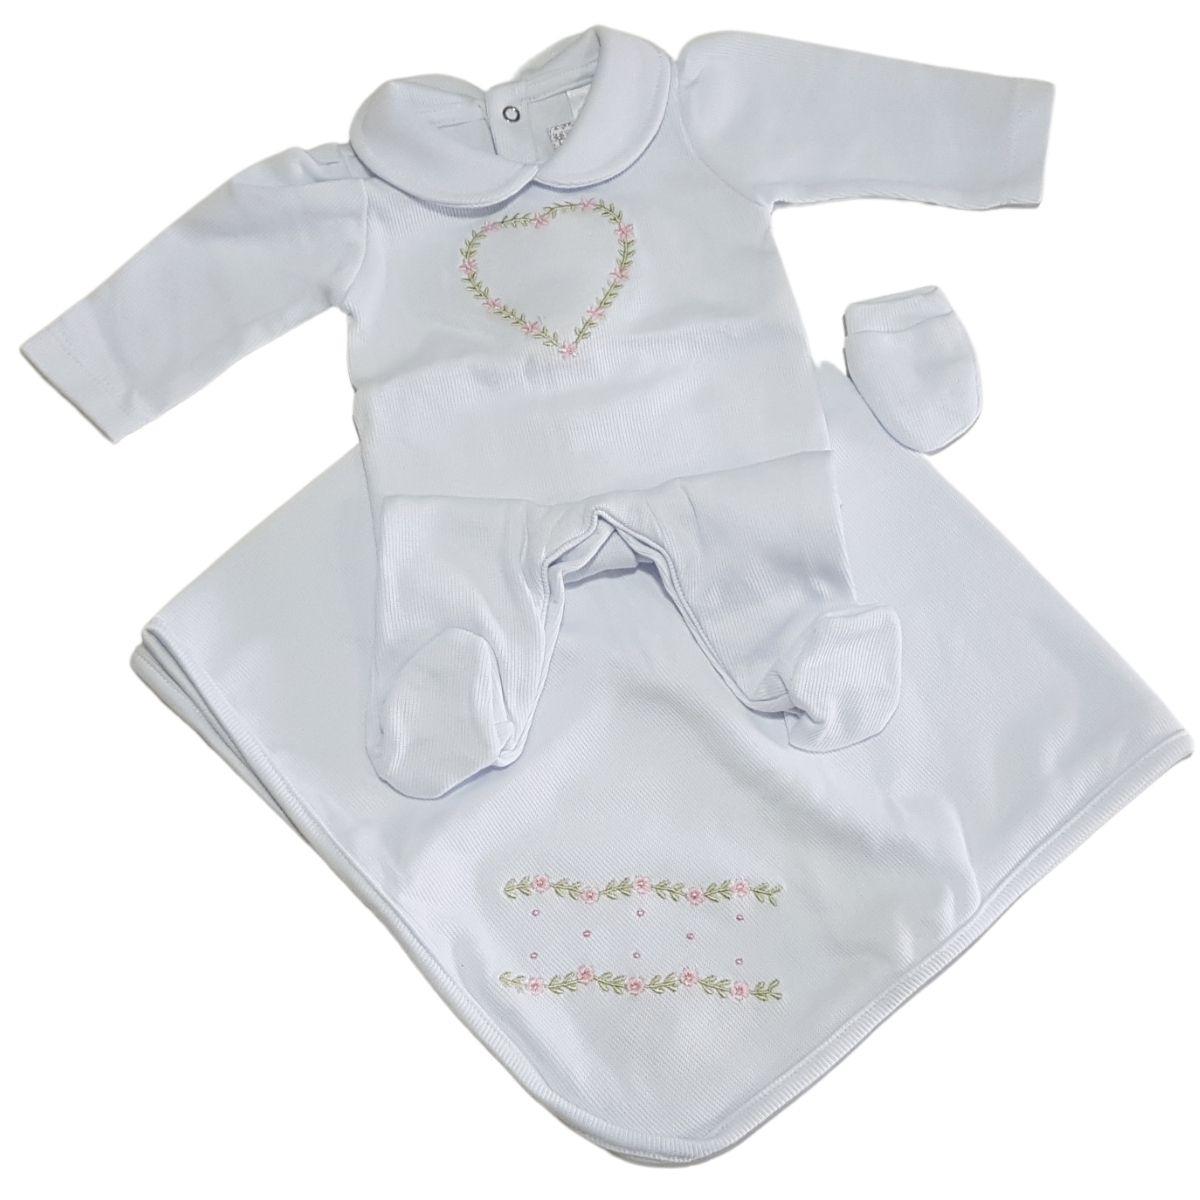 Saida Maternidade Bebê Menina Branca Florzinha Luxo 3 Peças Pirlipat